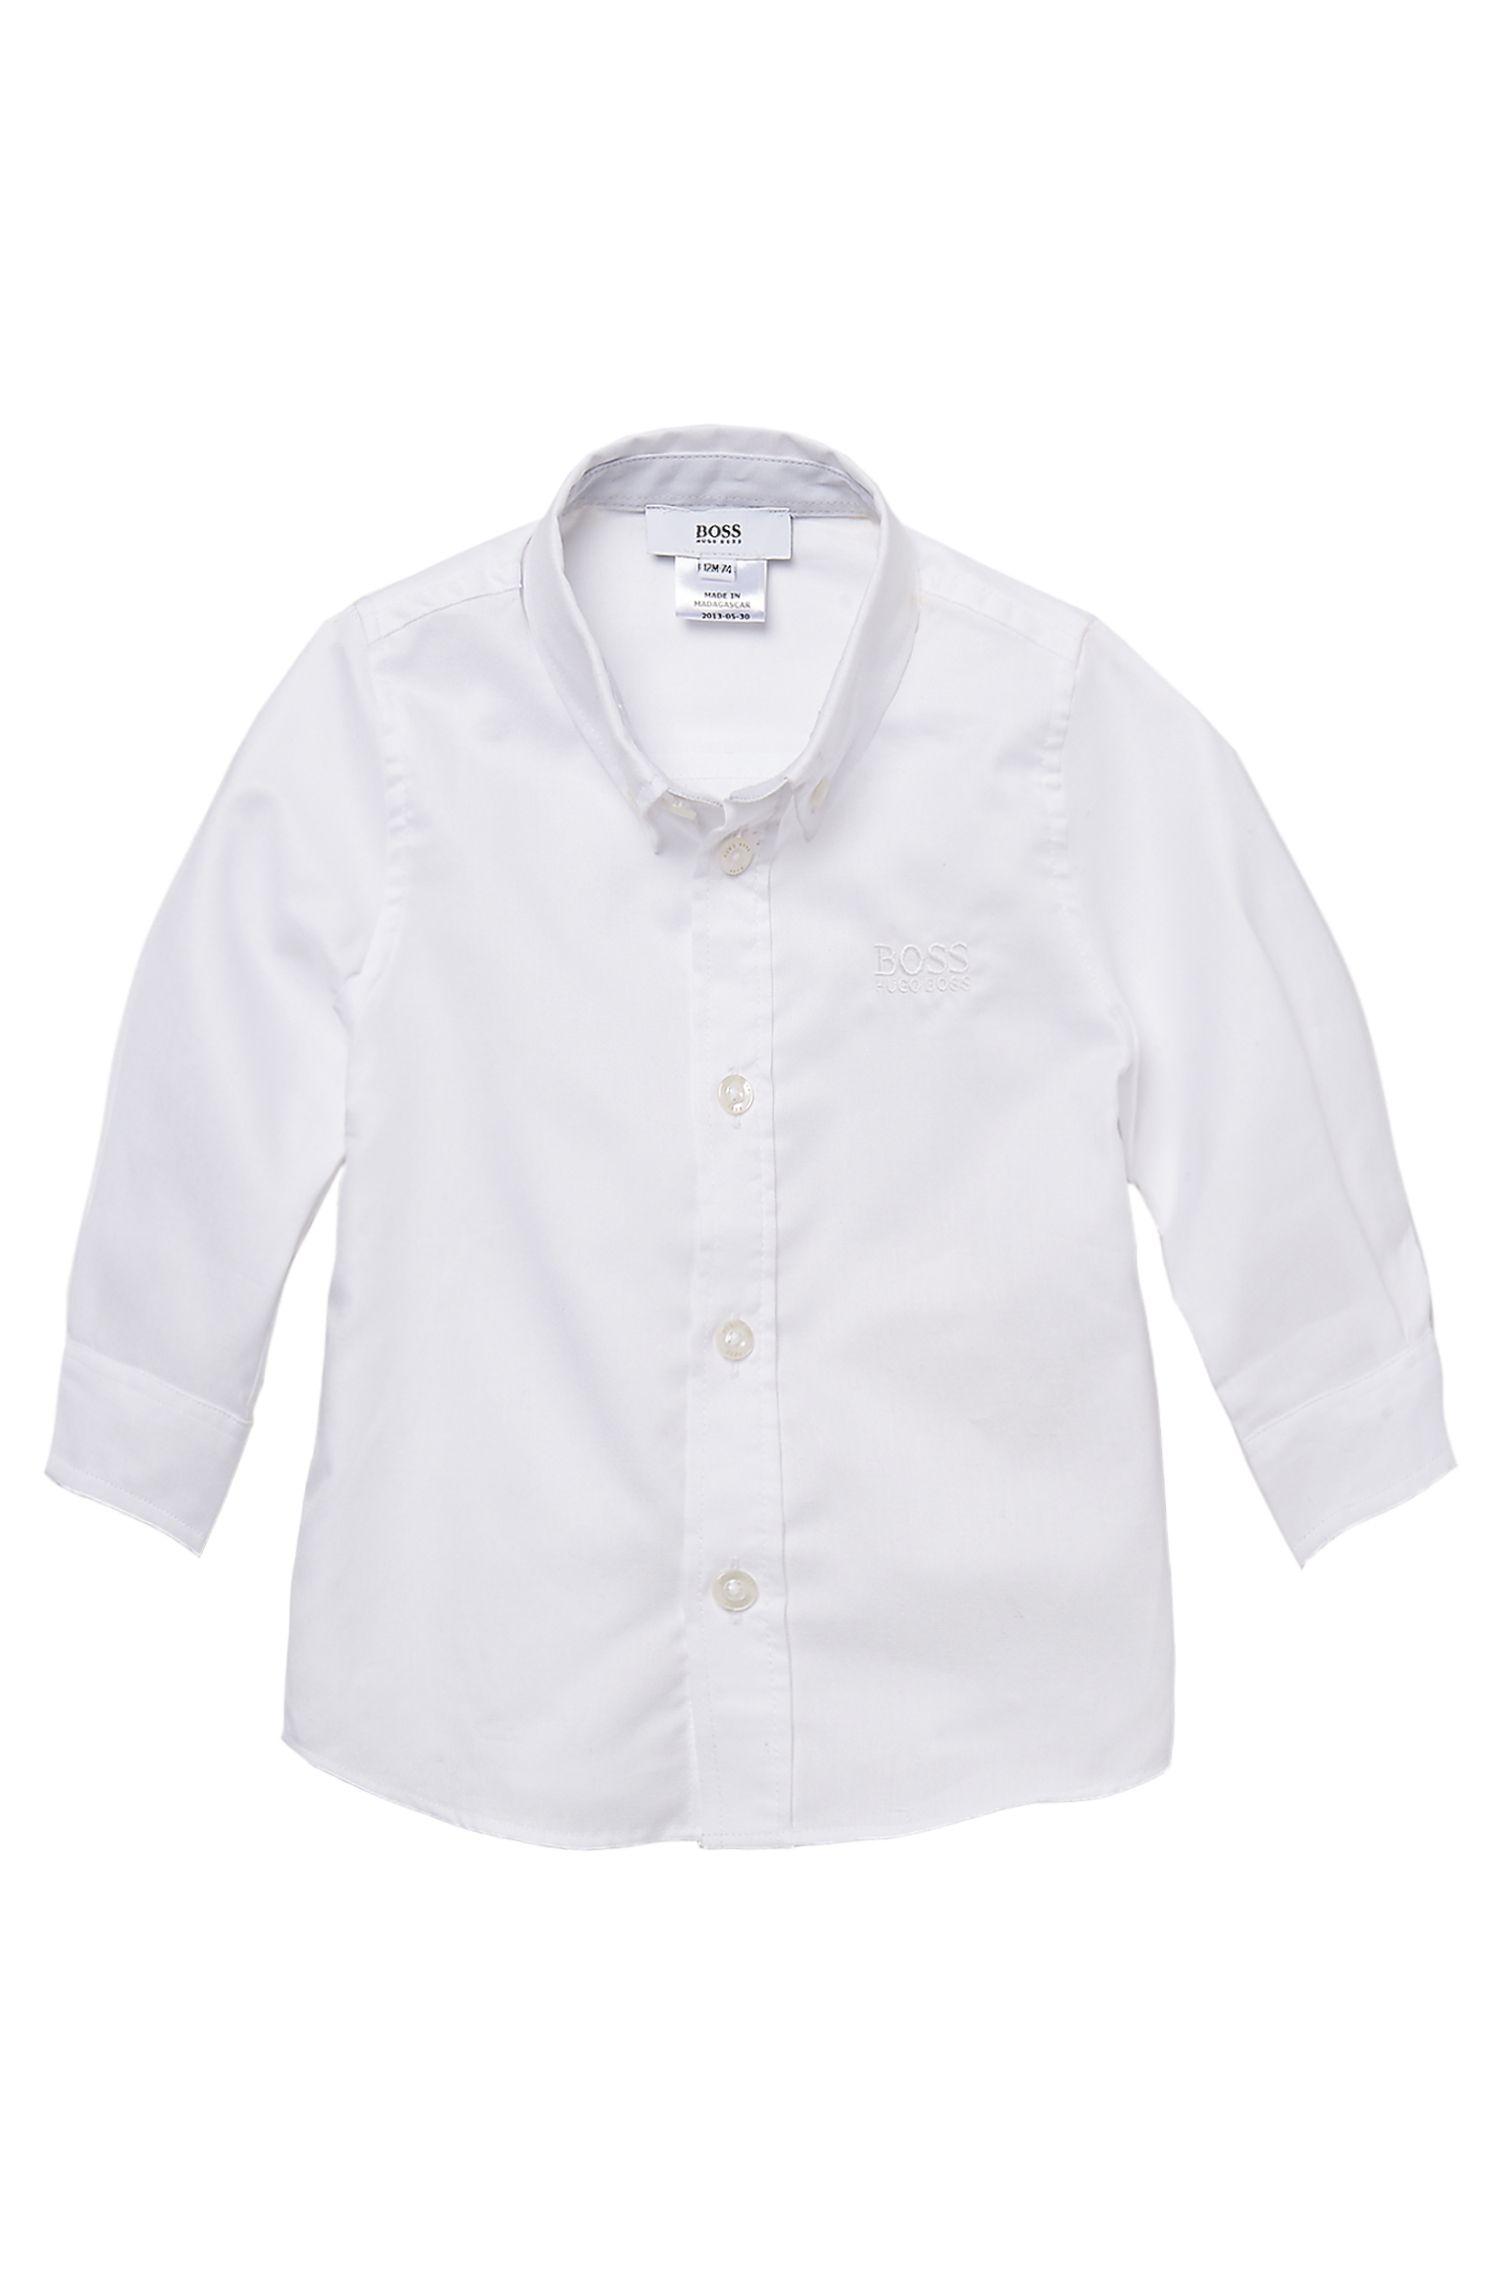 'J05241' | Toddler Cotton Button Down Shirt